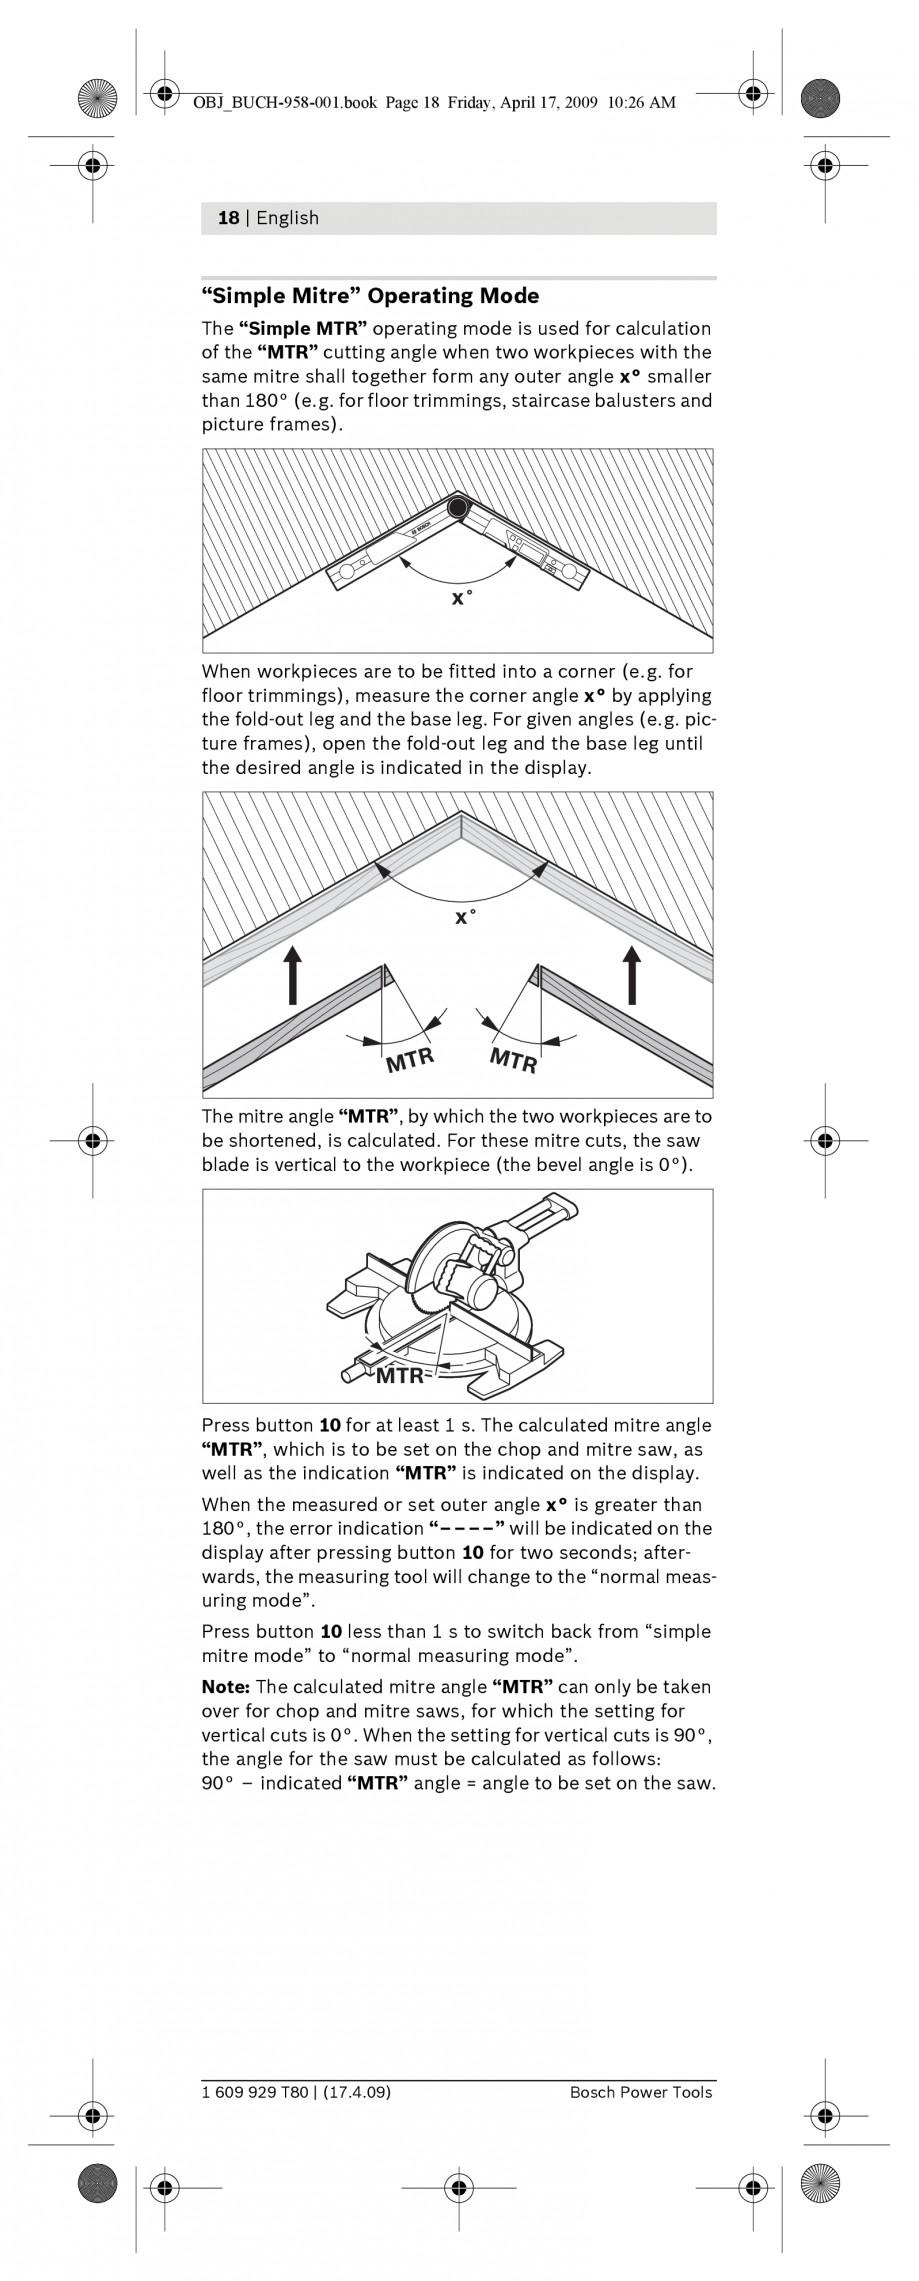 fisa tehnica professional goniometru digital bosch. Black Bedroom Furniture Sets. Home Design Ideas